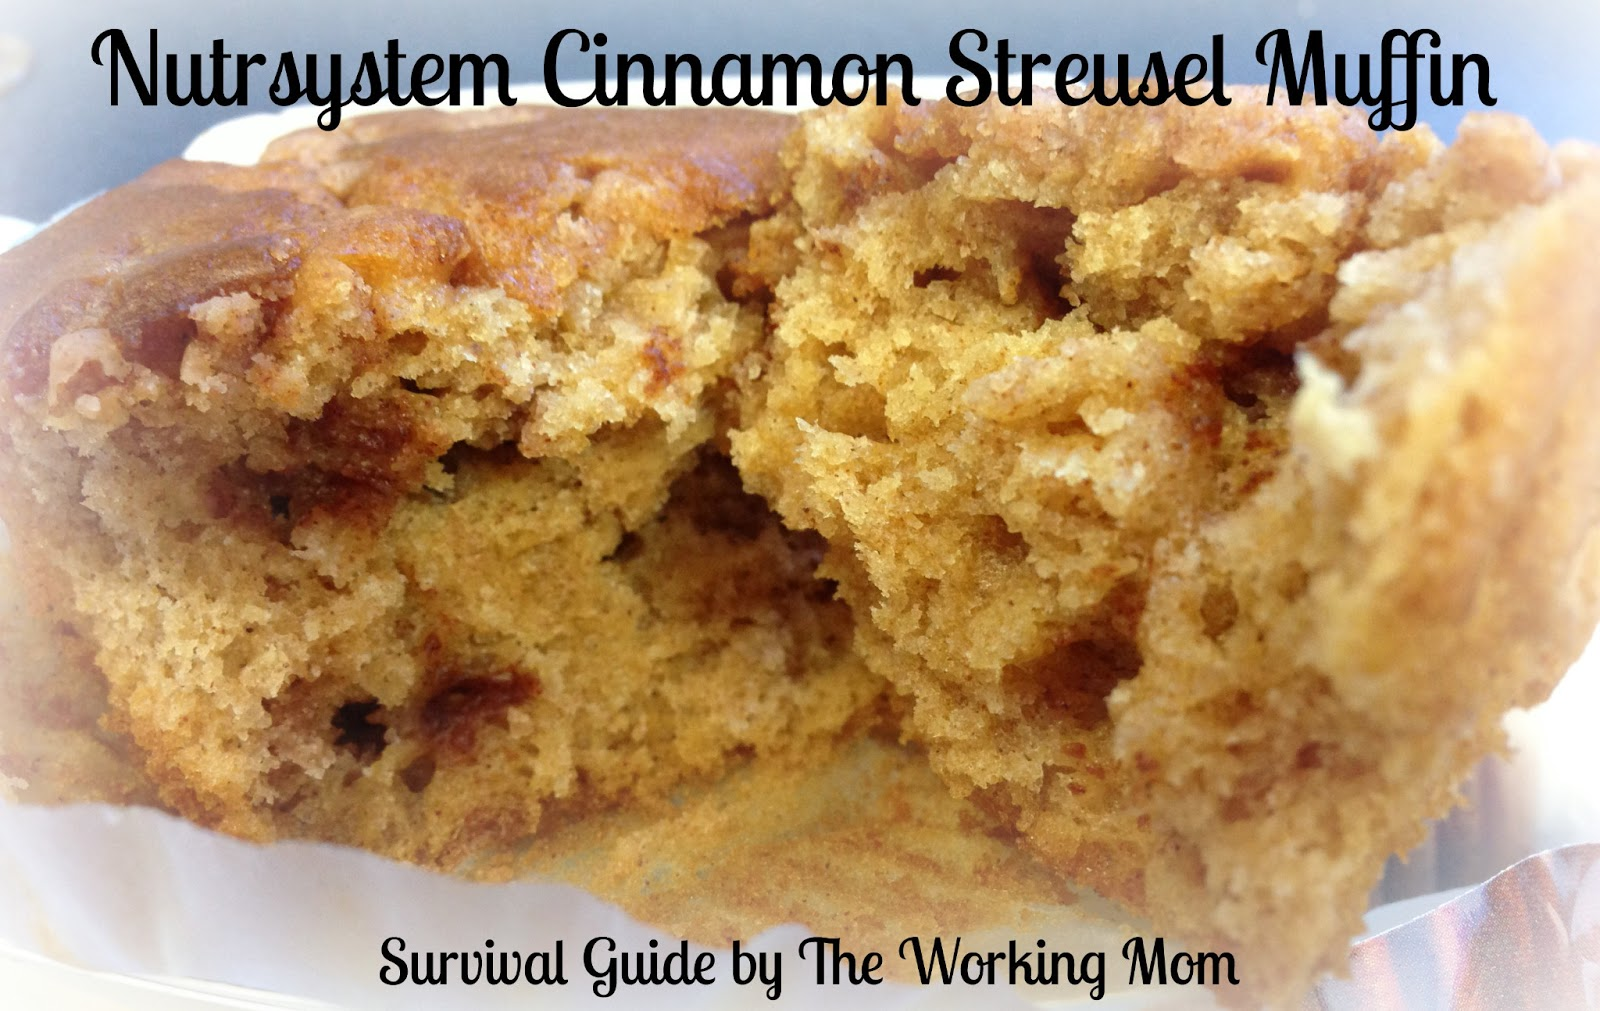 Nutrisystem blueberry muffins coupon for nutrisystem for Nutrisystem food vs lean cuisine